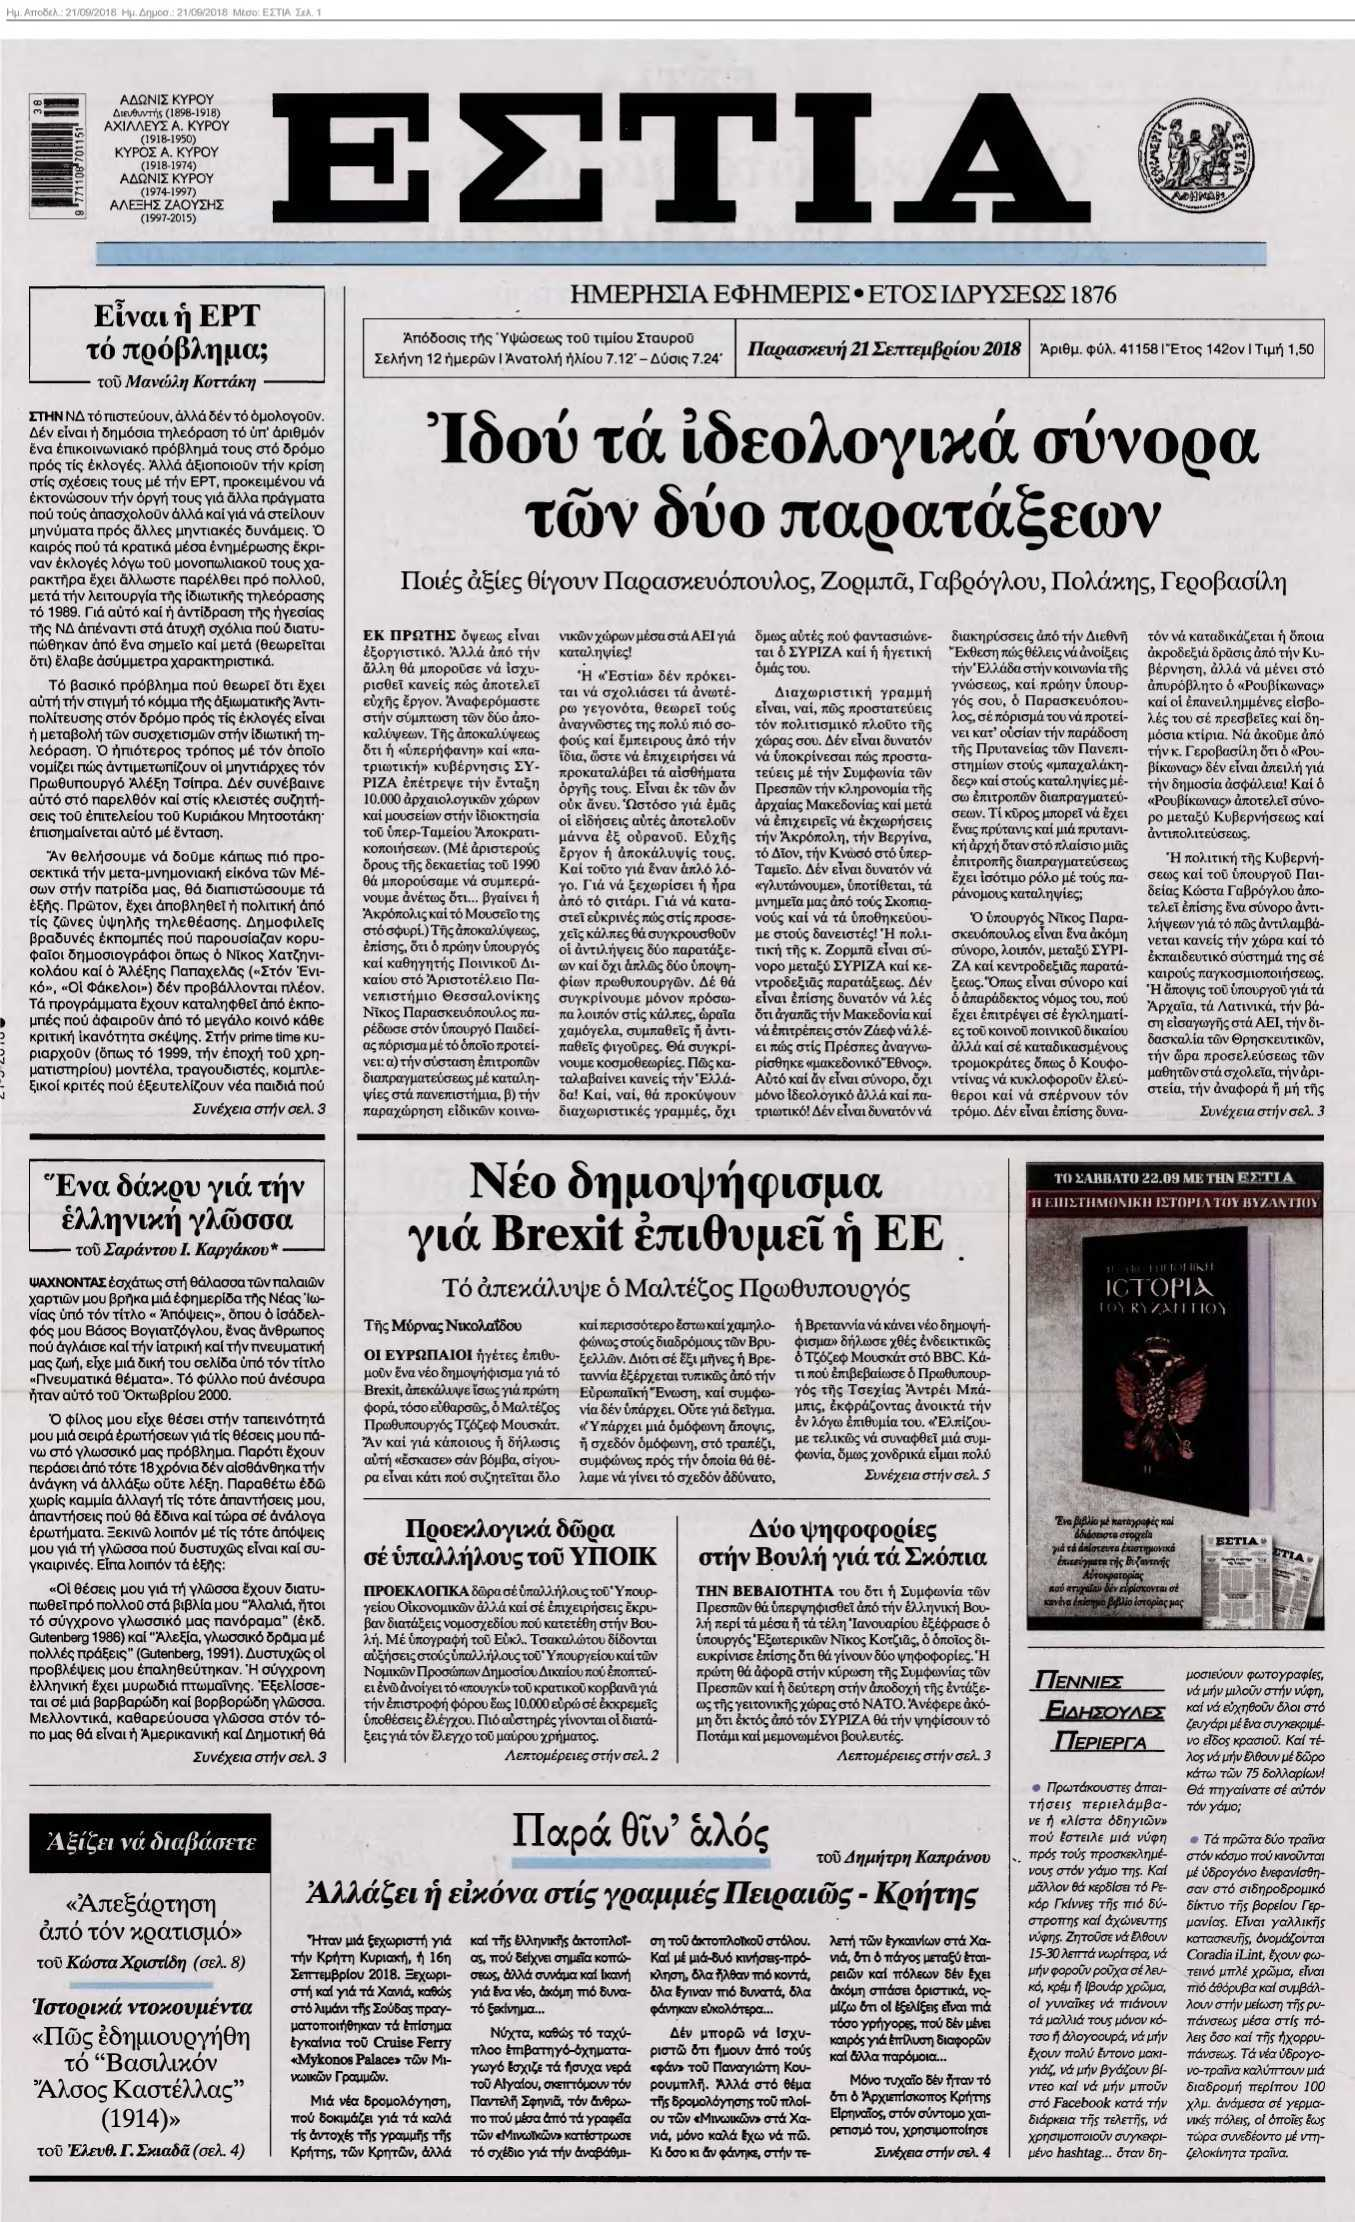 7e14c4a69a ΕΣΤΙΑ 21 09 2018 - ΕΦΗΜΕΡΙΔΕΣ - NewsIt.gr